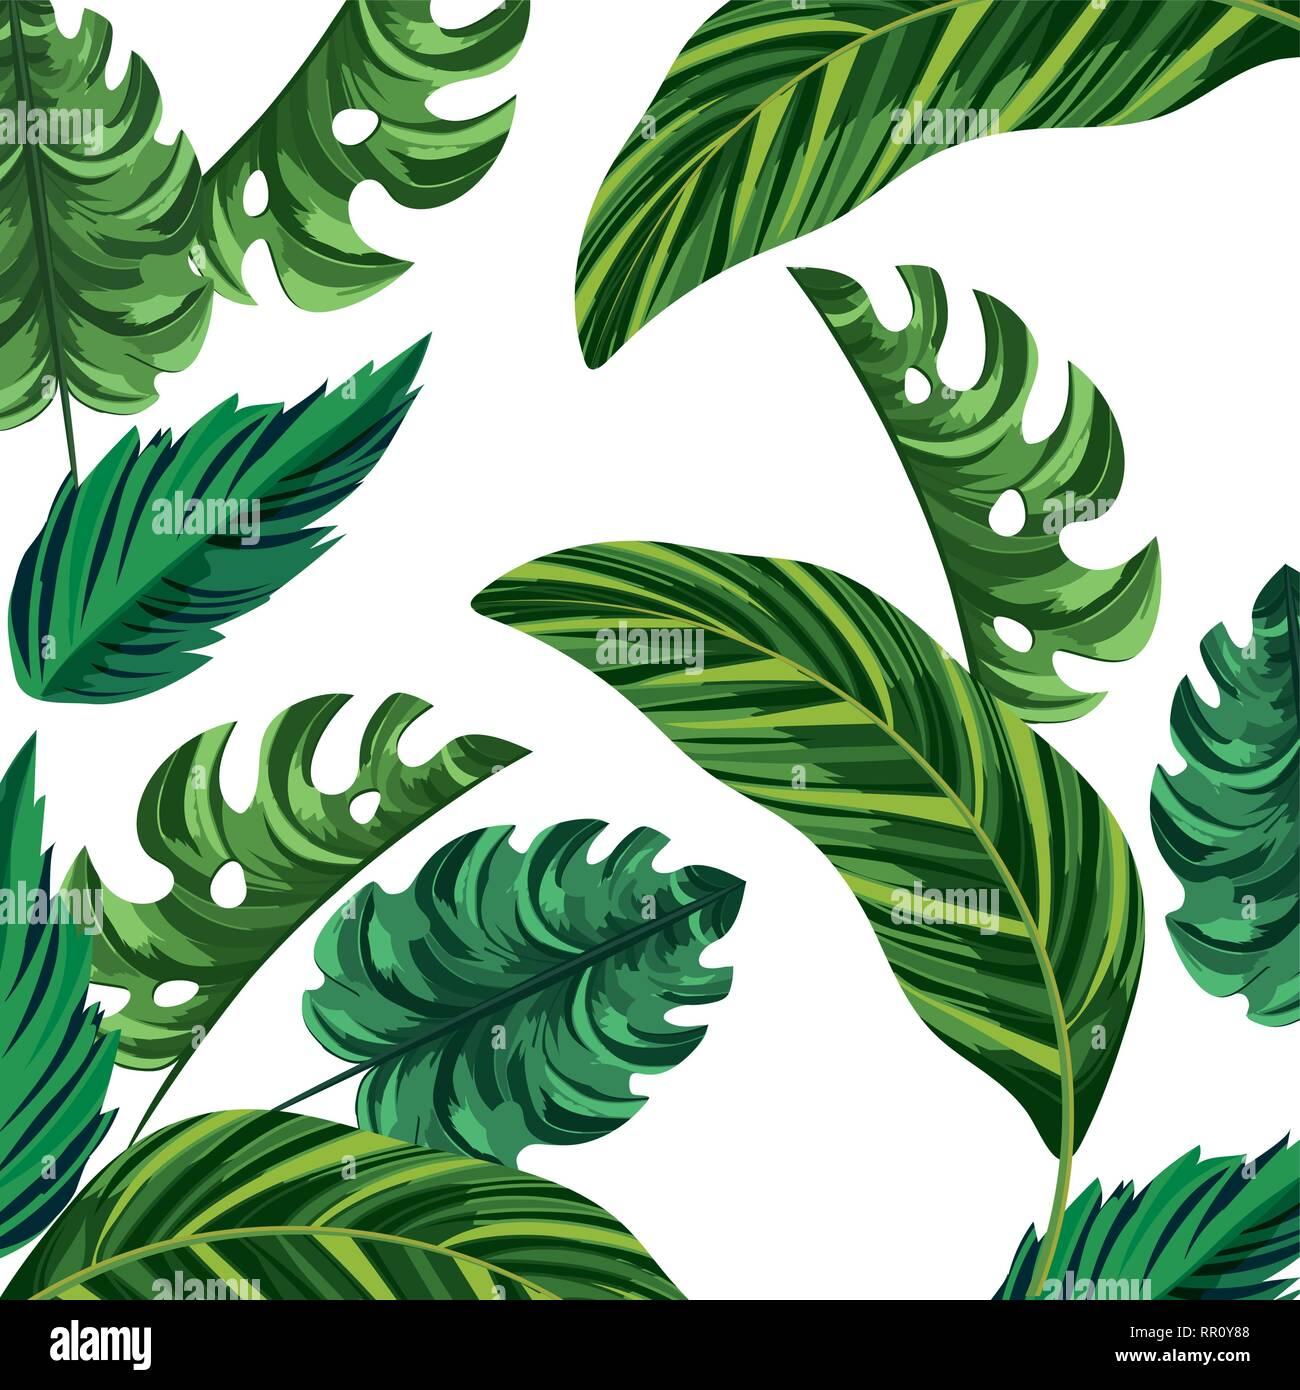 Nature Leafs Cartoon Stock Vector Image Art Alamy